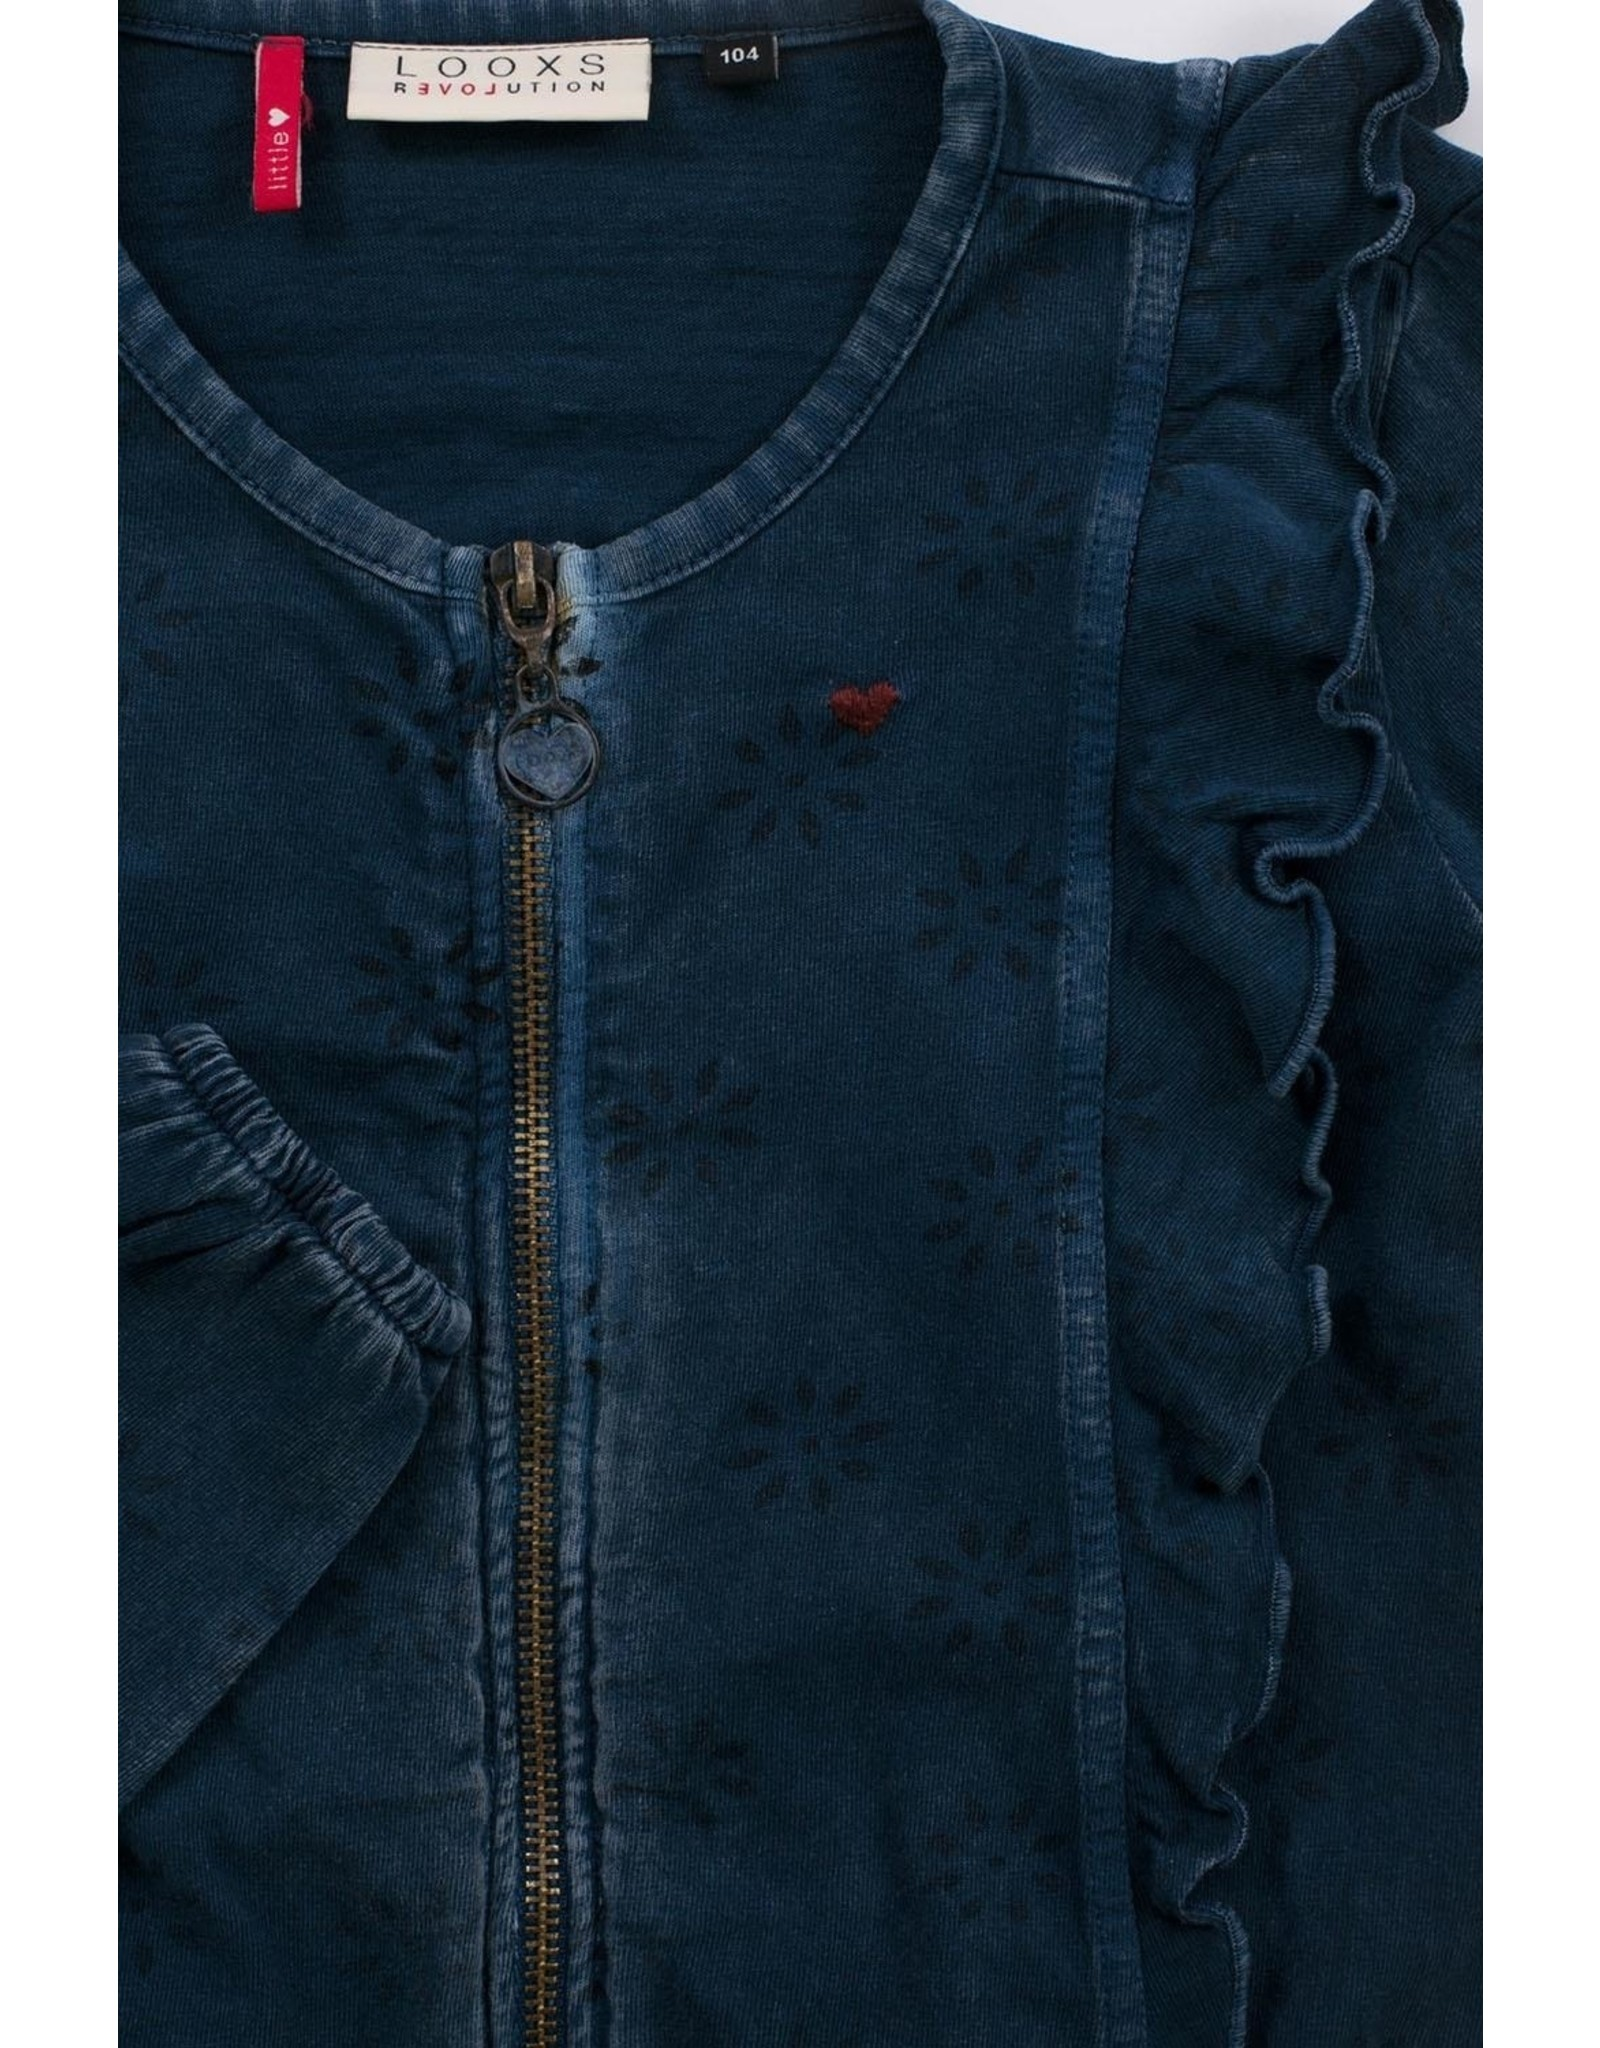 LOOXS Little Little cardigan INDIGO BLUE